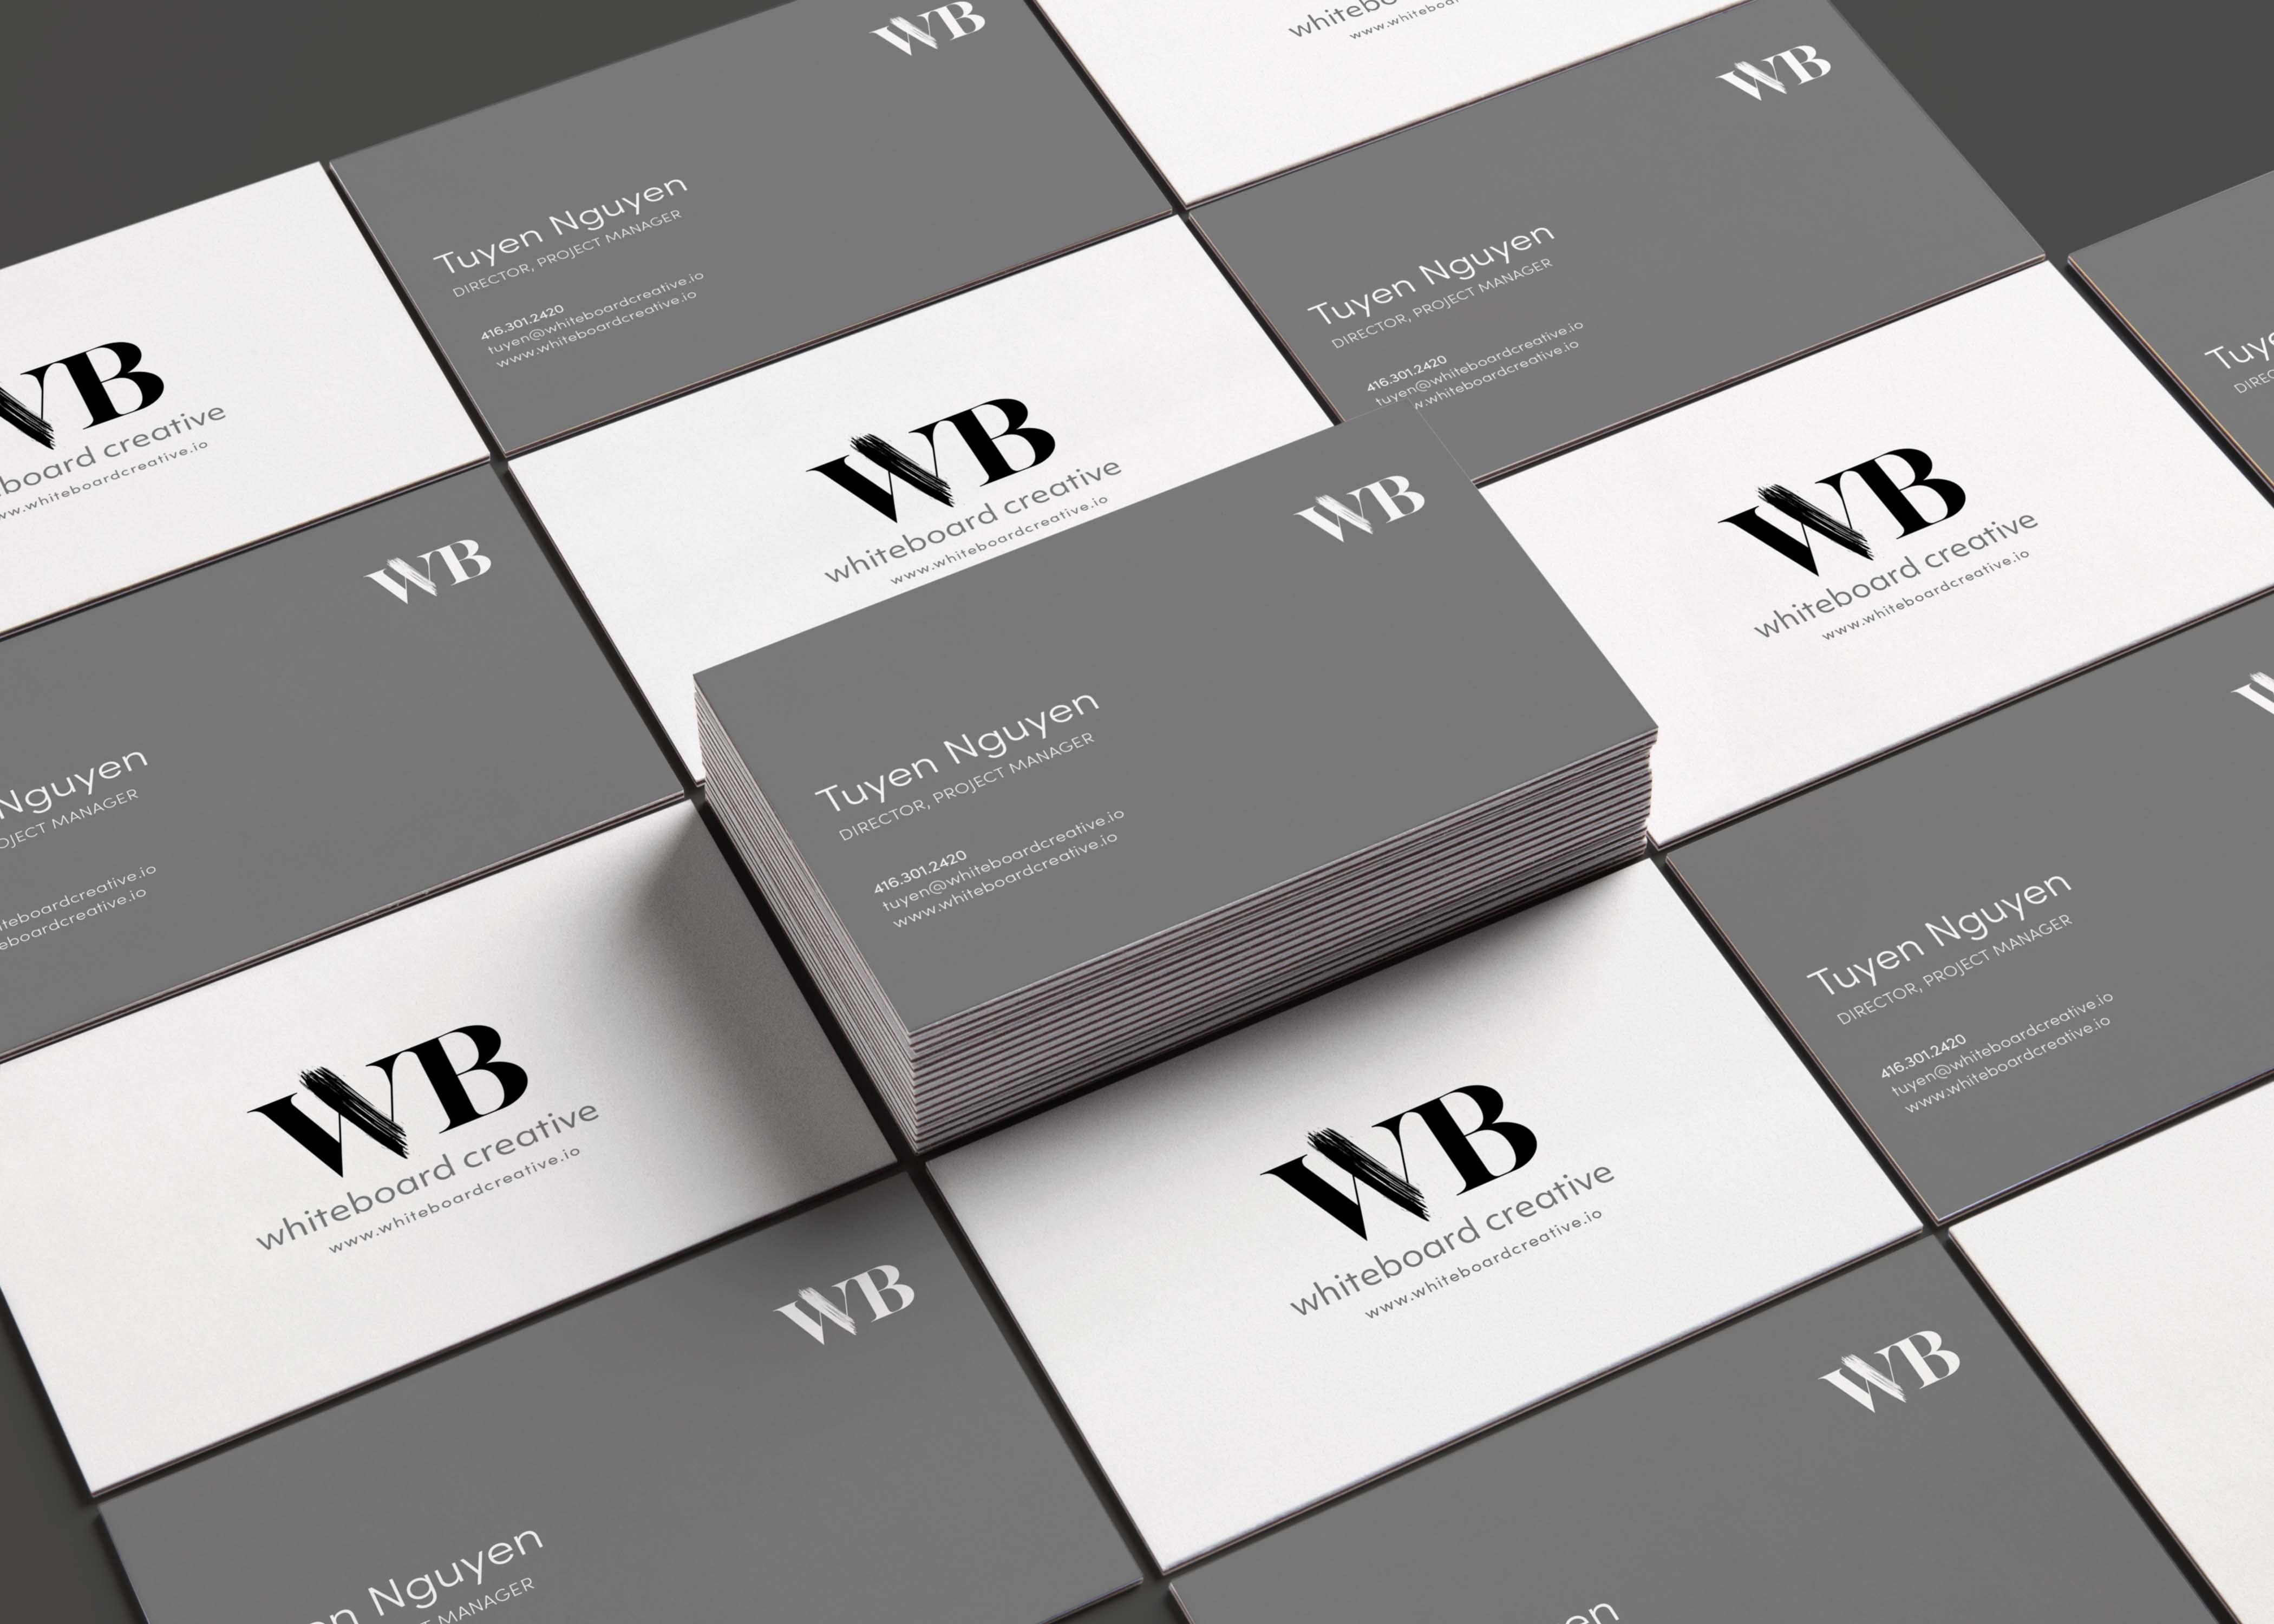 whiteboard creative lab business card design